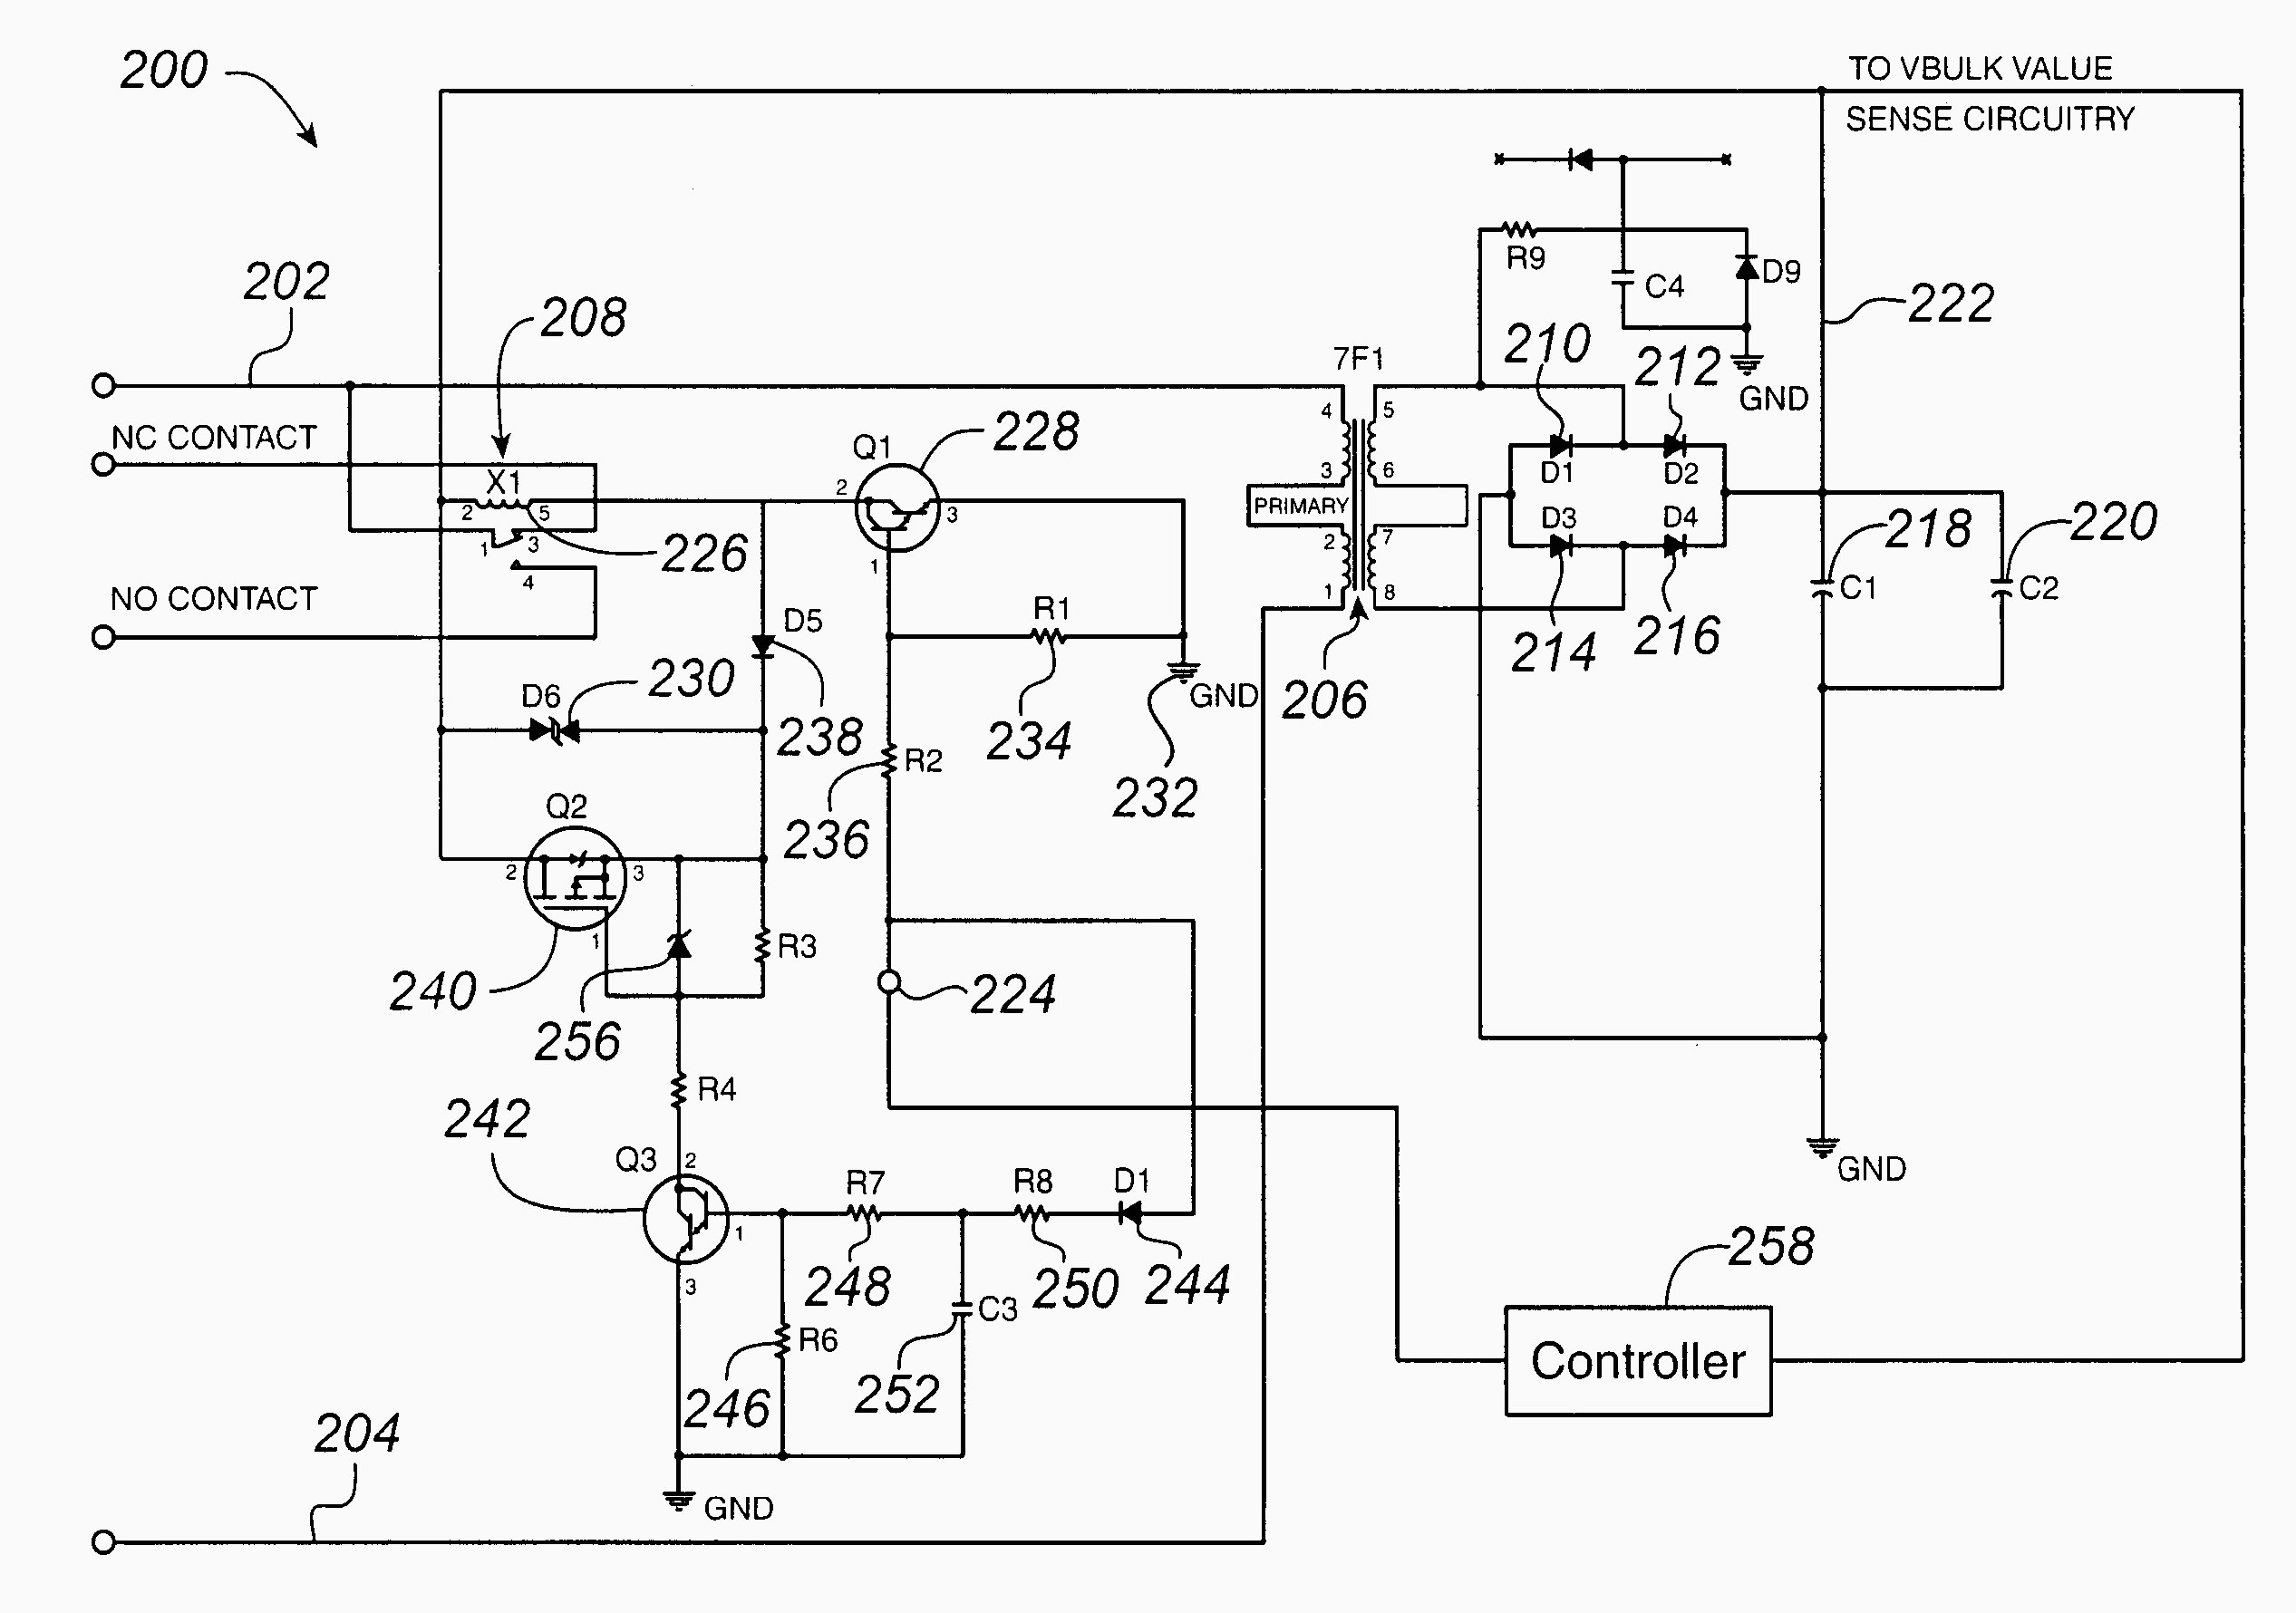 True Cooler Wiring Diagrams   Wiring Diagram Database on evaporative cooling diagram, swamp cooler motor diagram, swamp cooler fan diagram, refrigeration control wiring diagram, electric scooter controller wiring diagram, evaporative cooler diagram, air-handler wiring diagram, heat pump wiring diagram, 230 volt motor wiring diagram, 1974 ford ignition wiring diagram, swamp cooler thermostat control, swamp cooler thermostat wiring, switched outlet wiring diagram, walk-in freezer commercial electrical wiring diagram, walk-in freezer defrost timer wiring diagram, ac motor wiring diagram, tecumseh compressor wiring diagram, swamp cooler wiring 240, swamp cooler control switch, little giant pump wiring diagram,